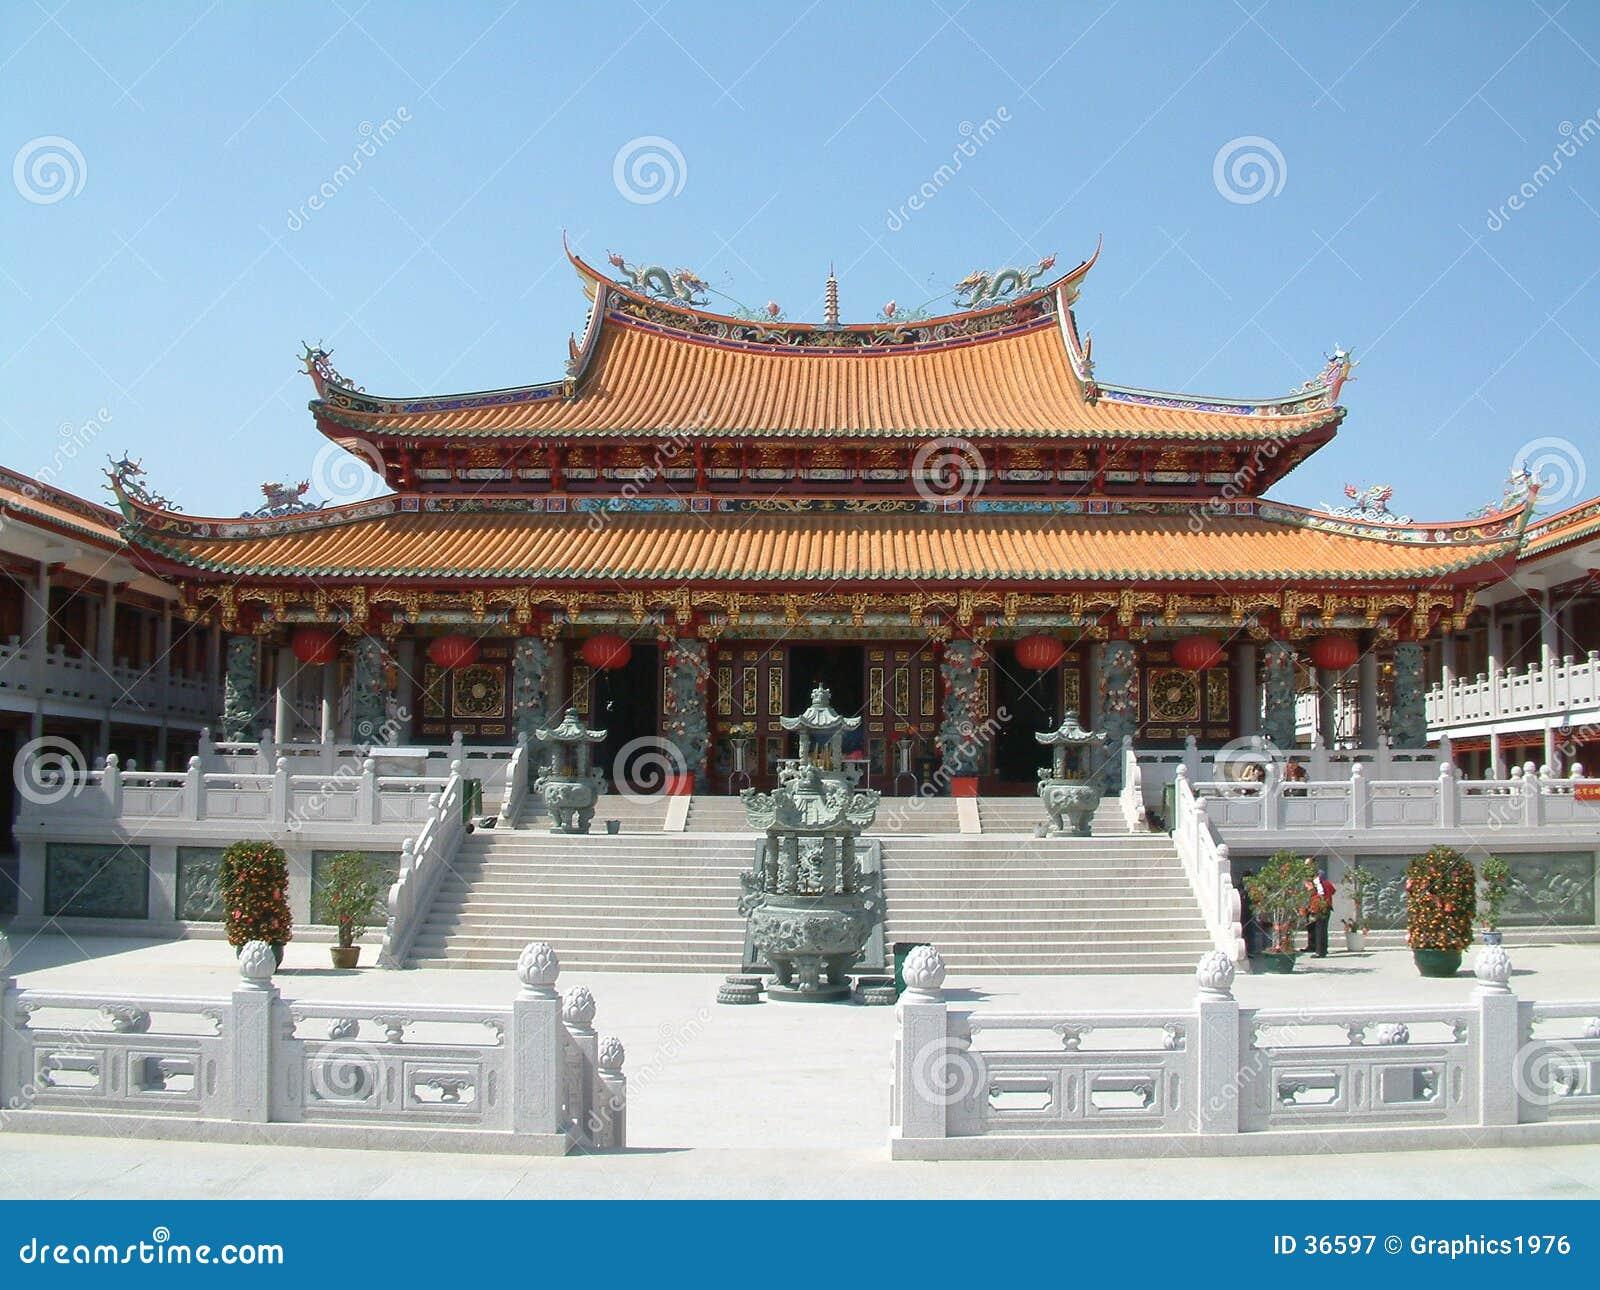 Chinesischer Tempel (Macau)